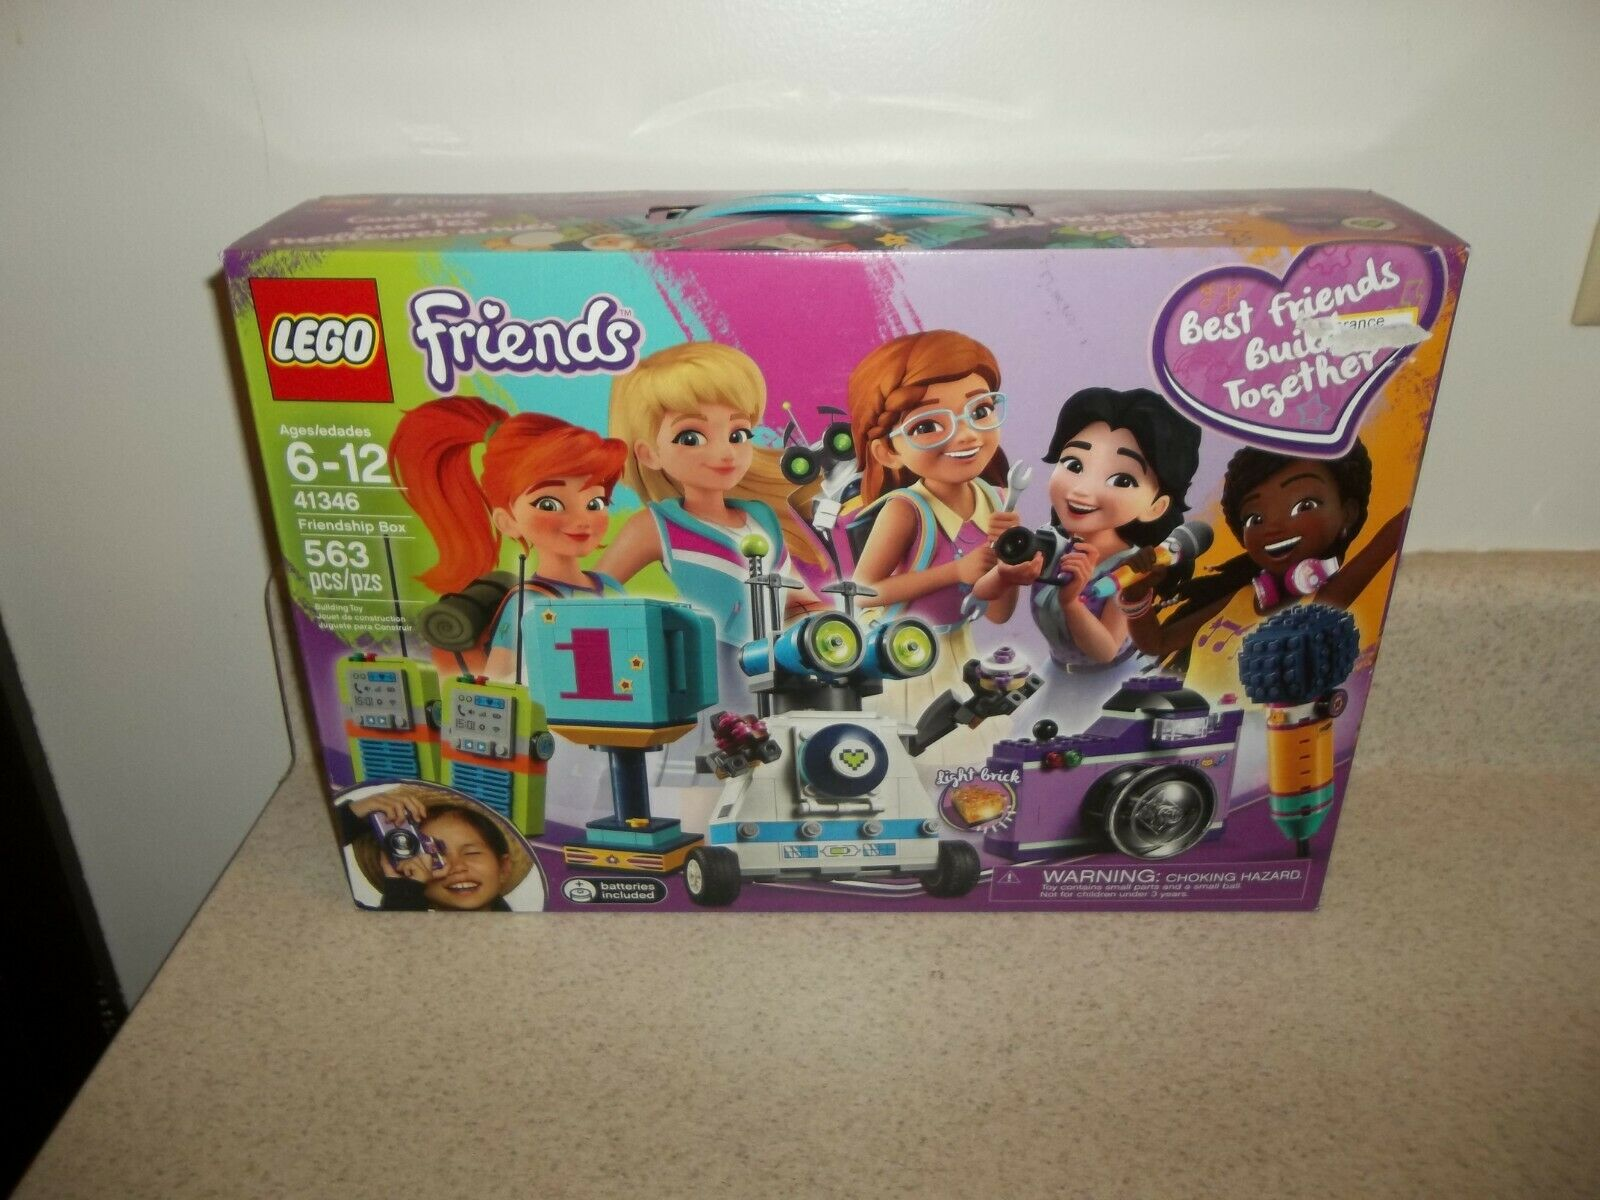 LEGO Friends  Friendship Box Building Building Building Play Set 41346 NEW NIB 1020 868419